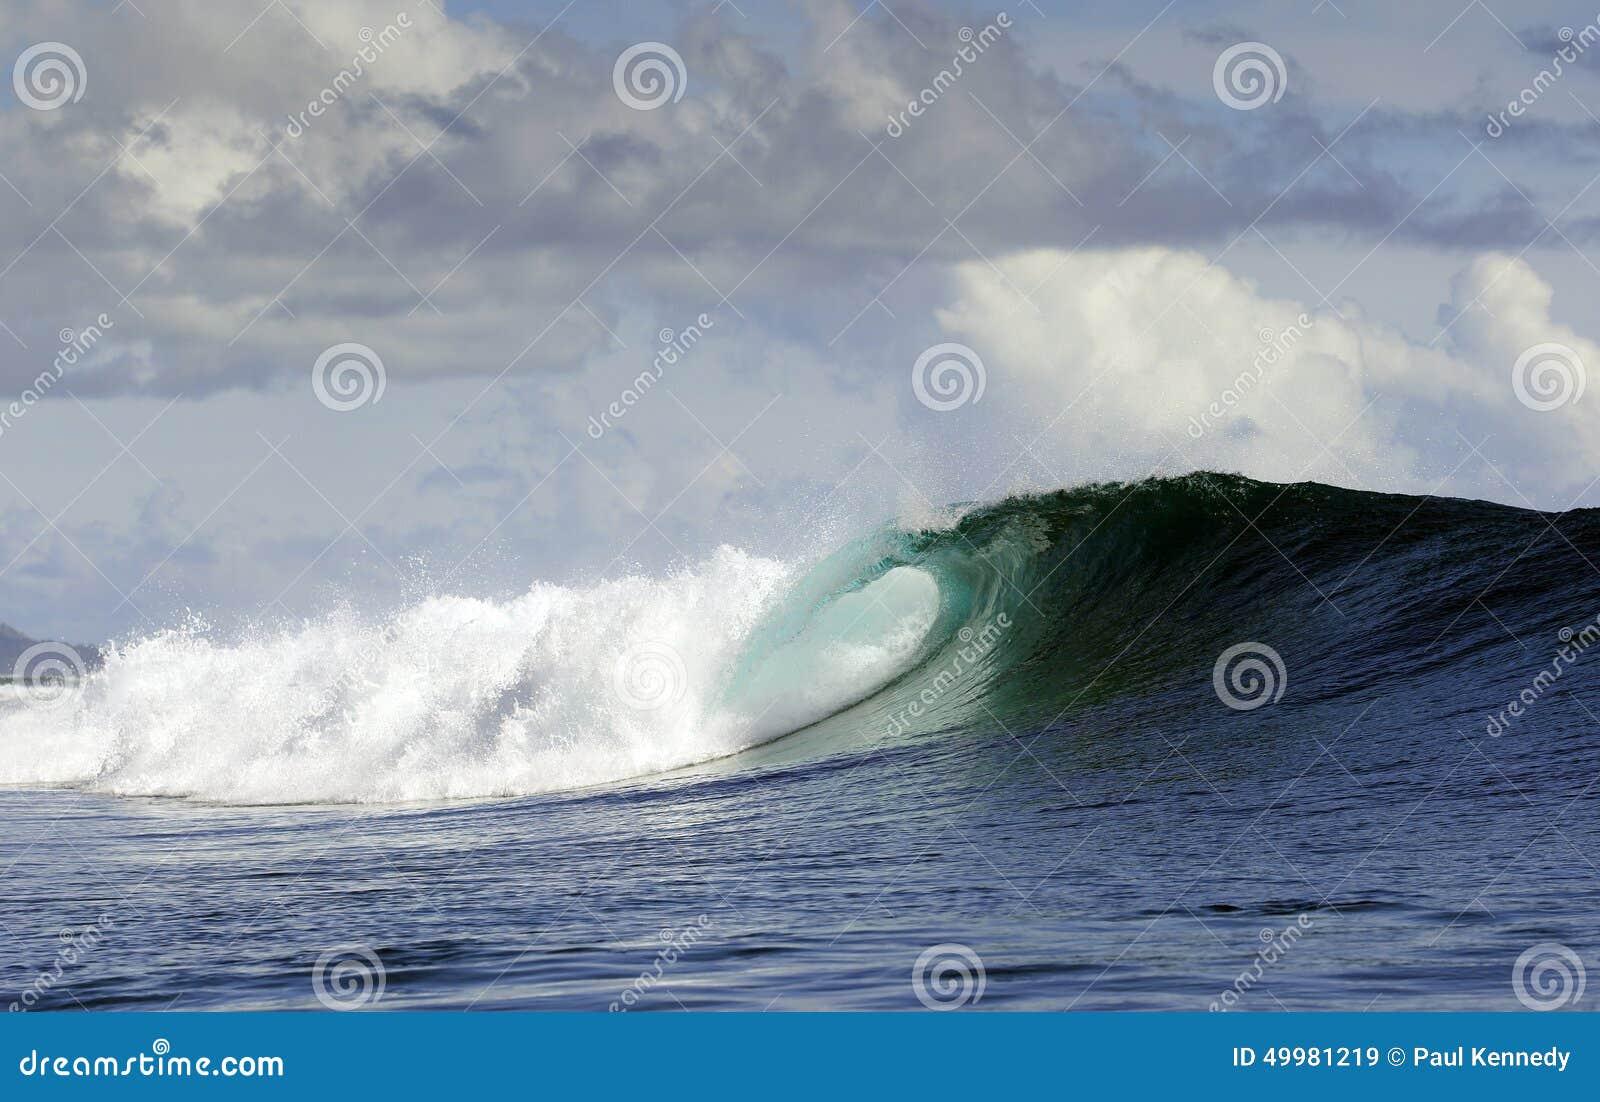 Pacific Ocean surfing wave